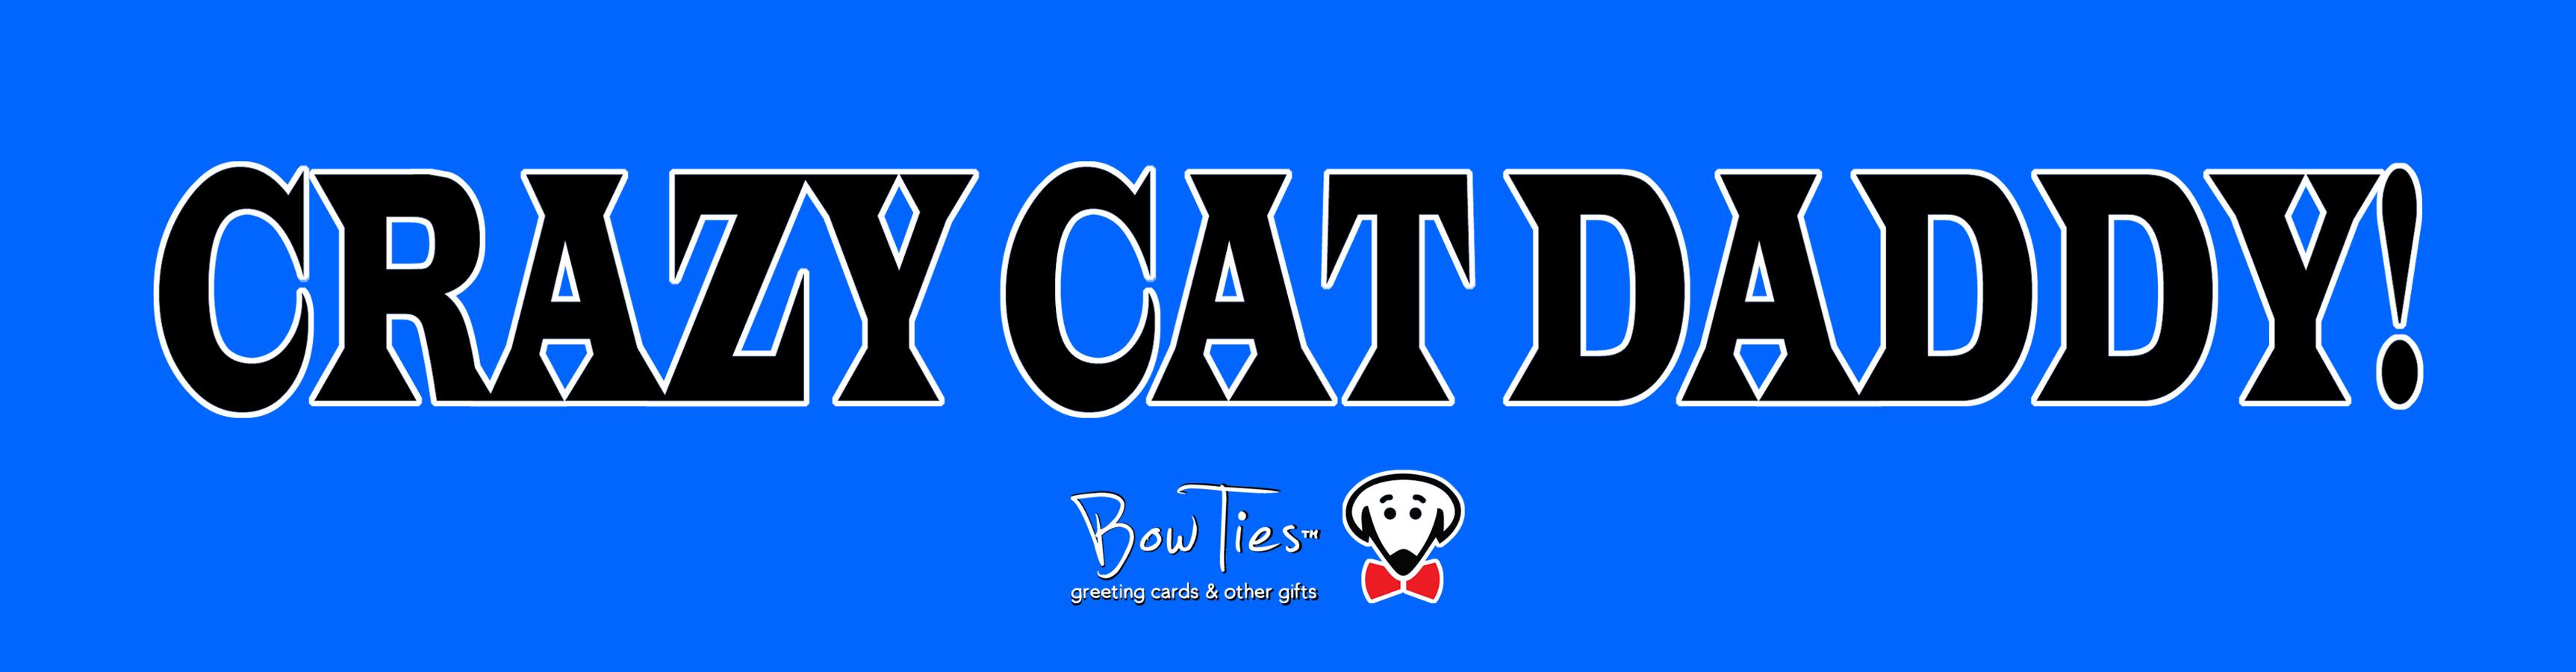 Crazy Cat Daddy – sticker